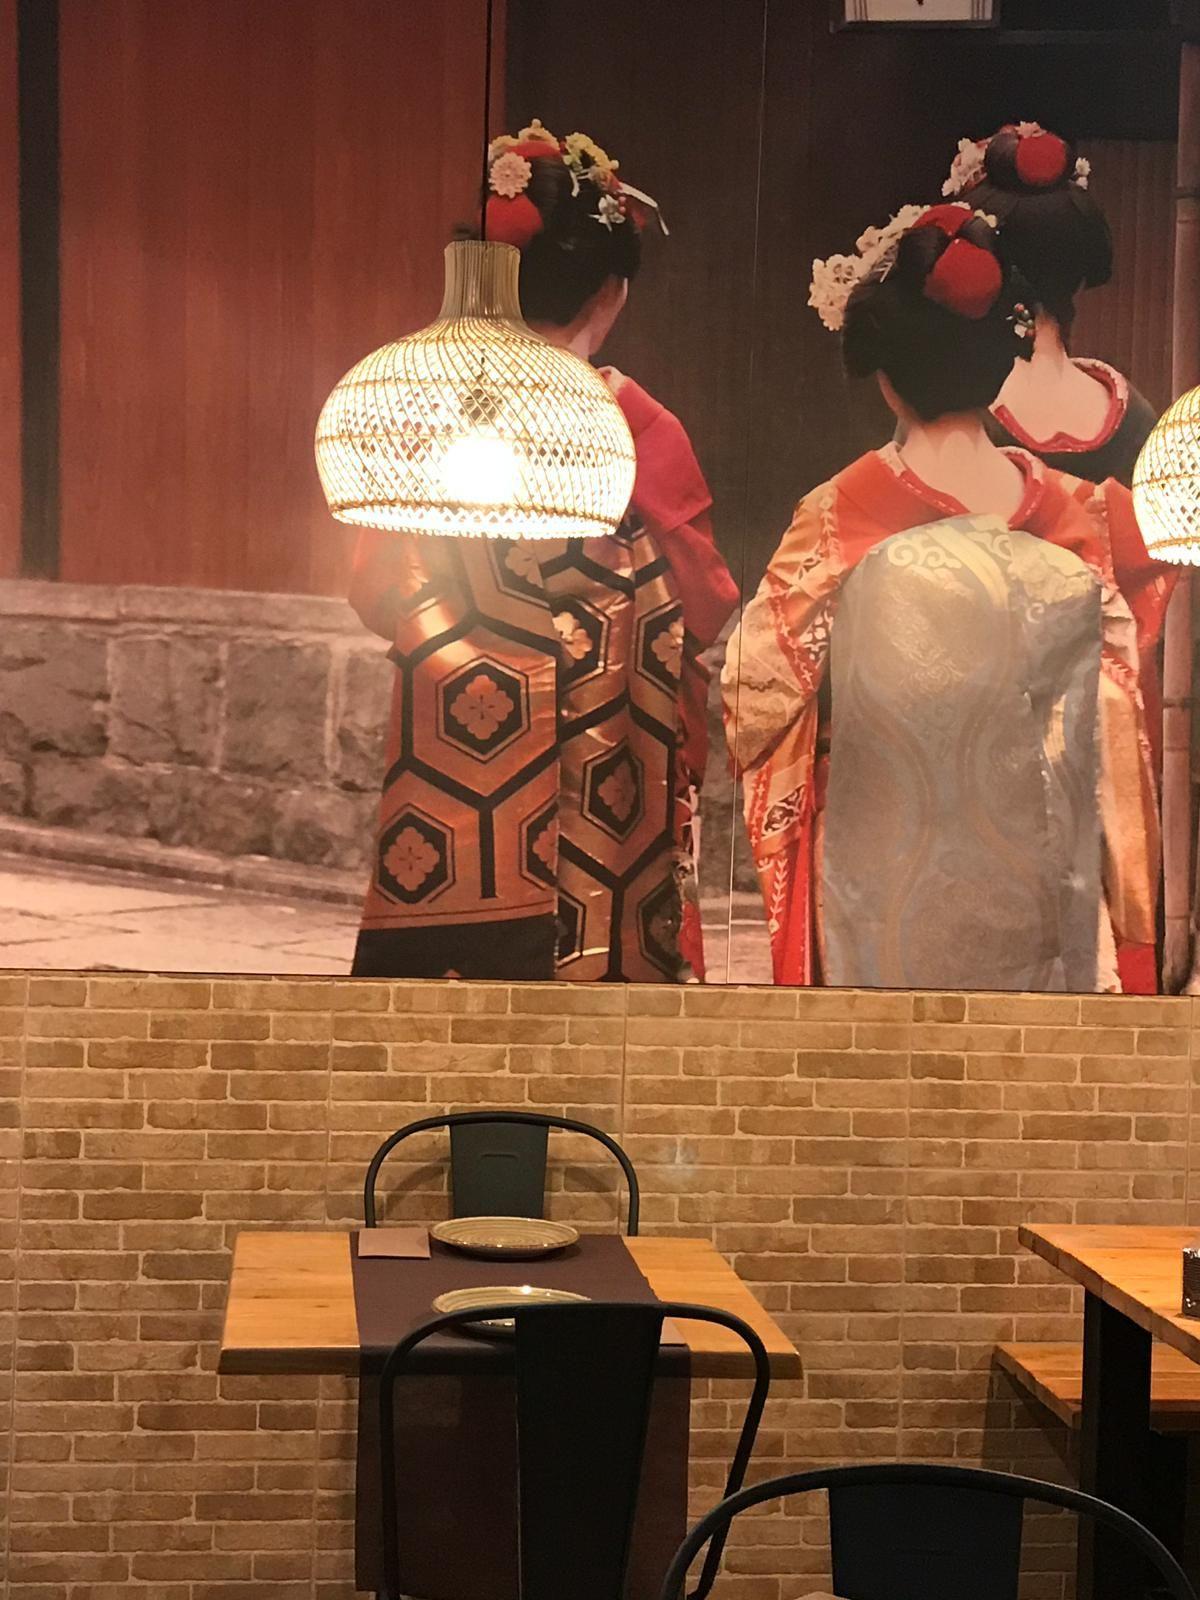 Restaurante japonés ramen en Poblenou Barcelona